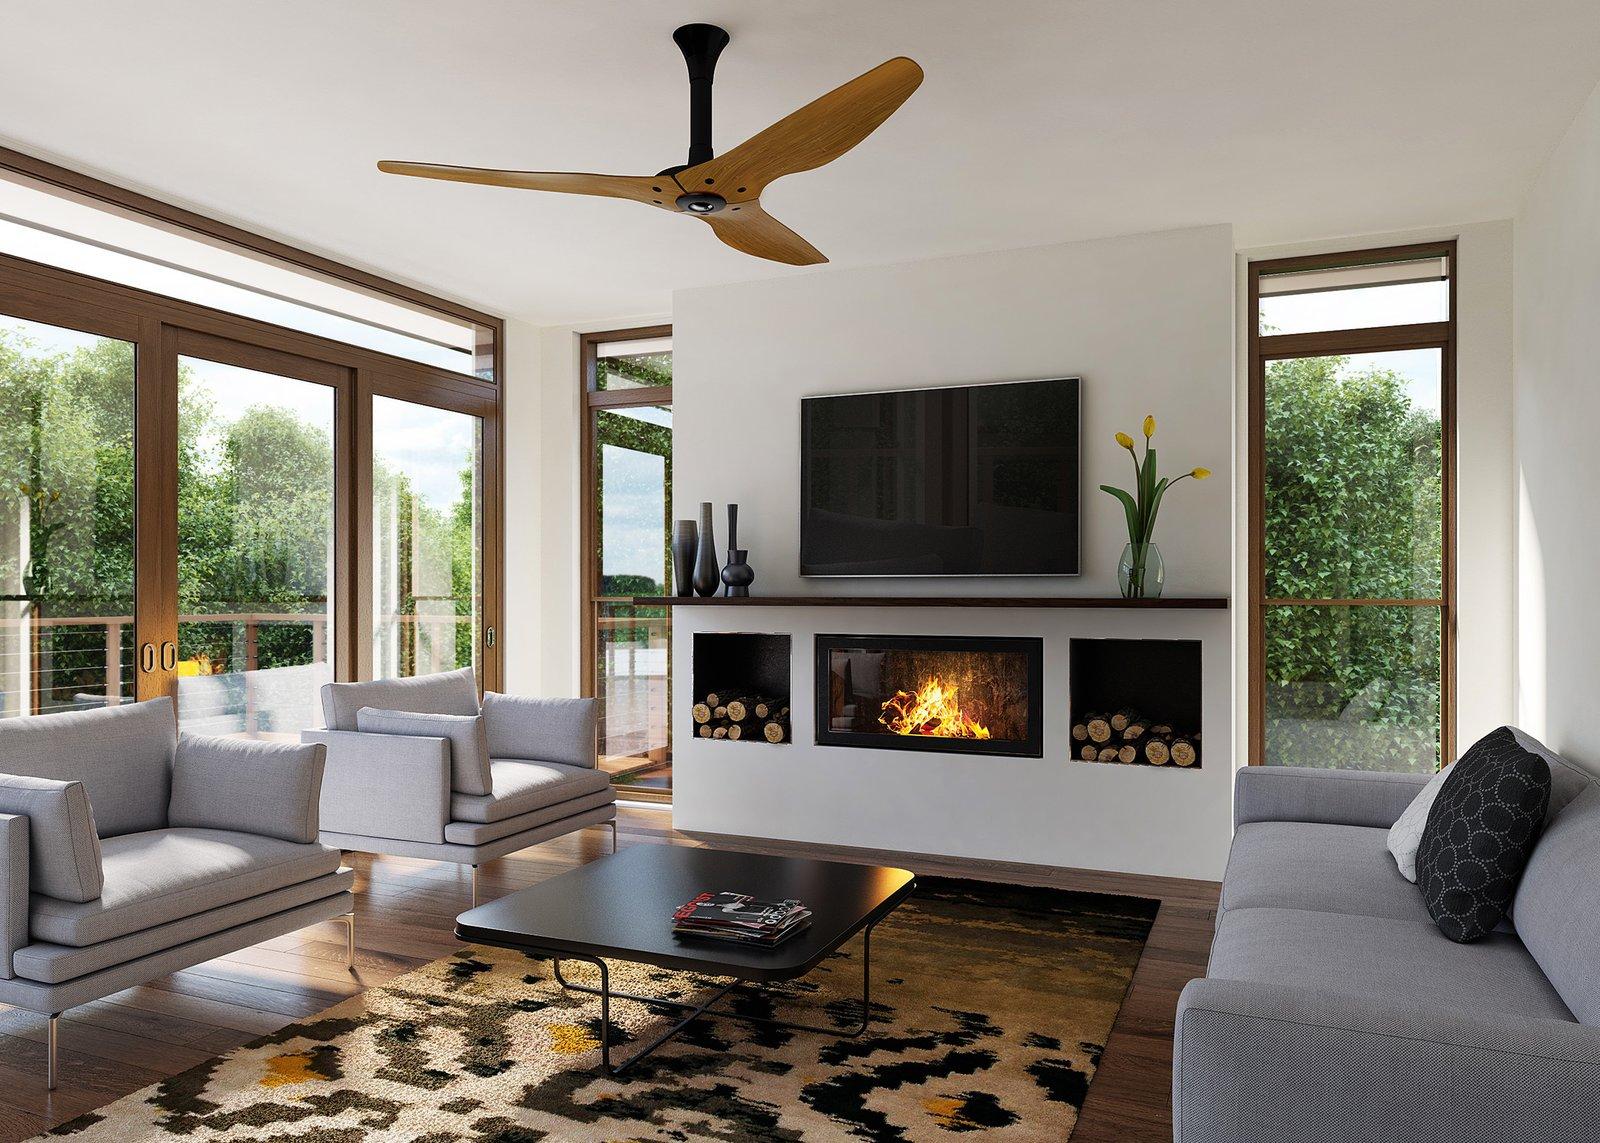 The World S First Smart Ceiling Fan Cuts Energy Bills In